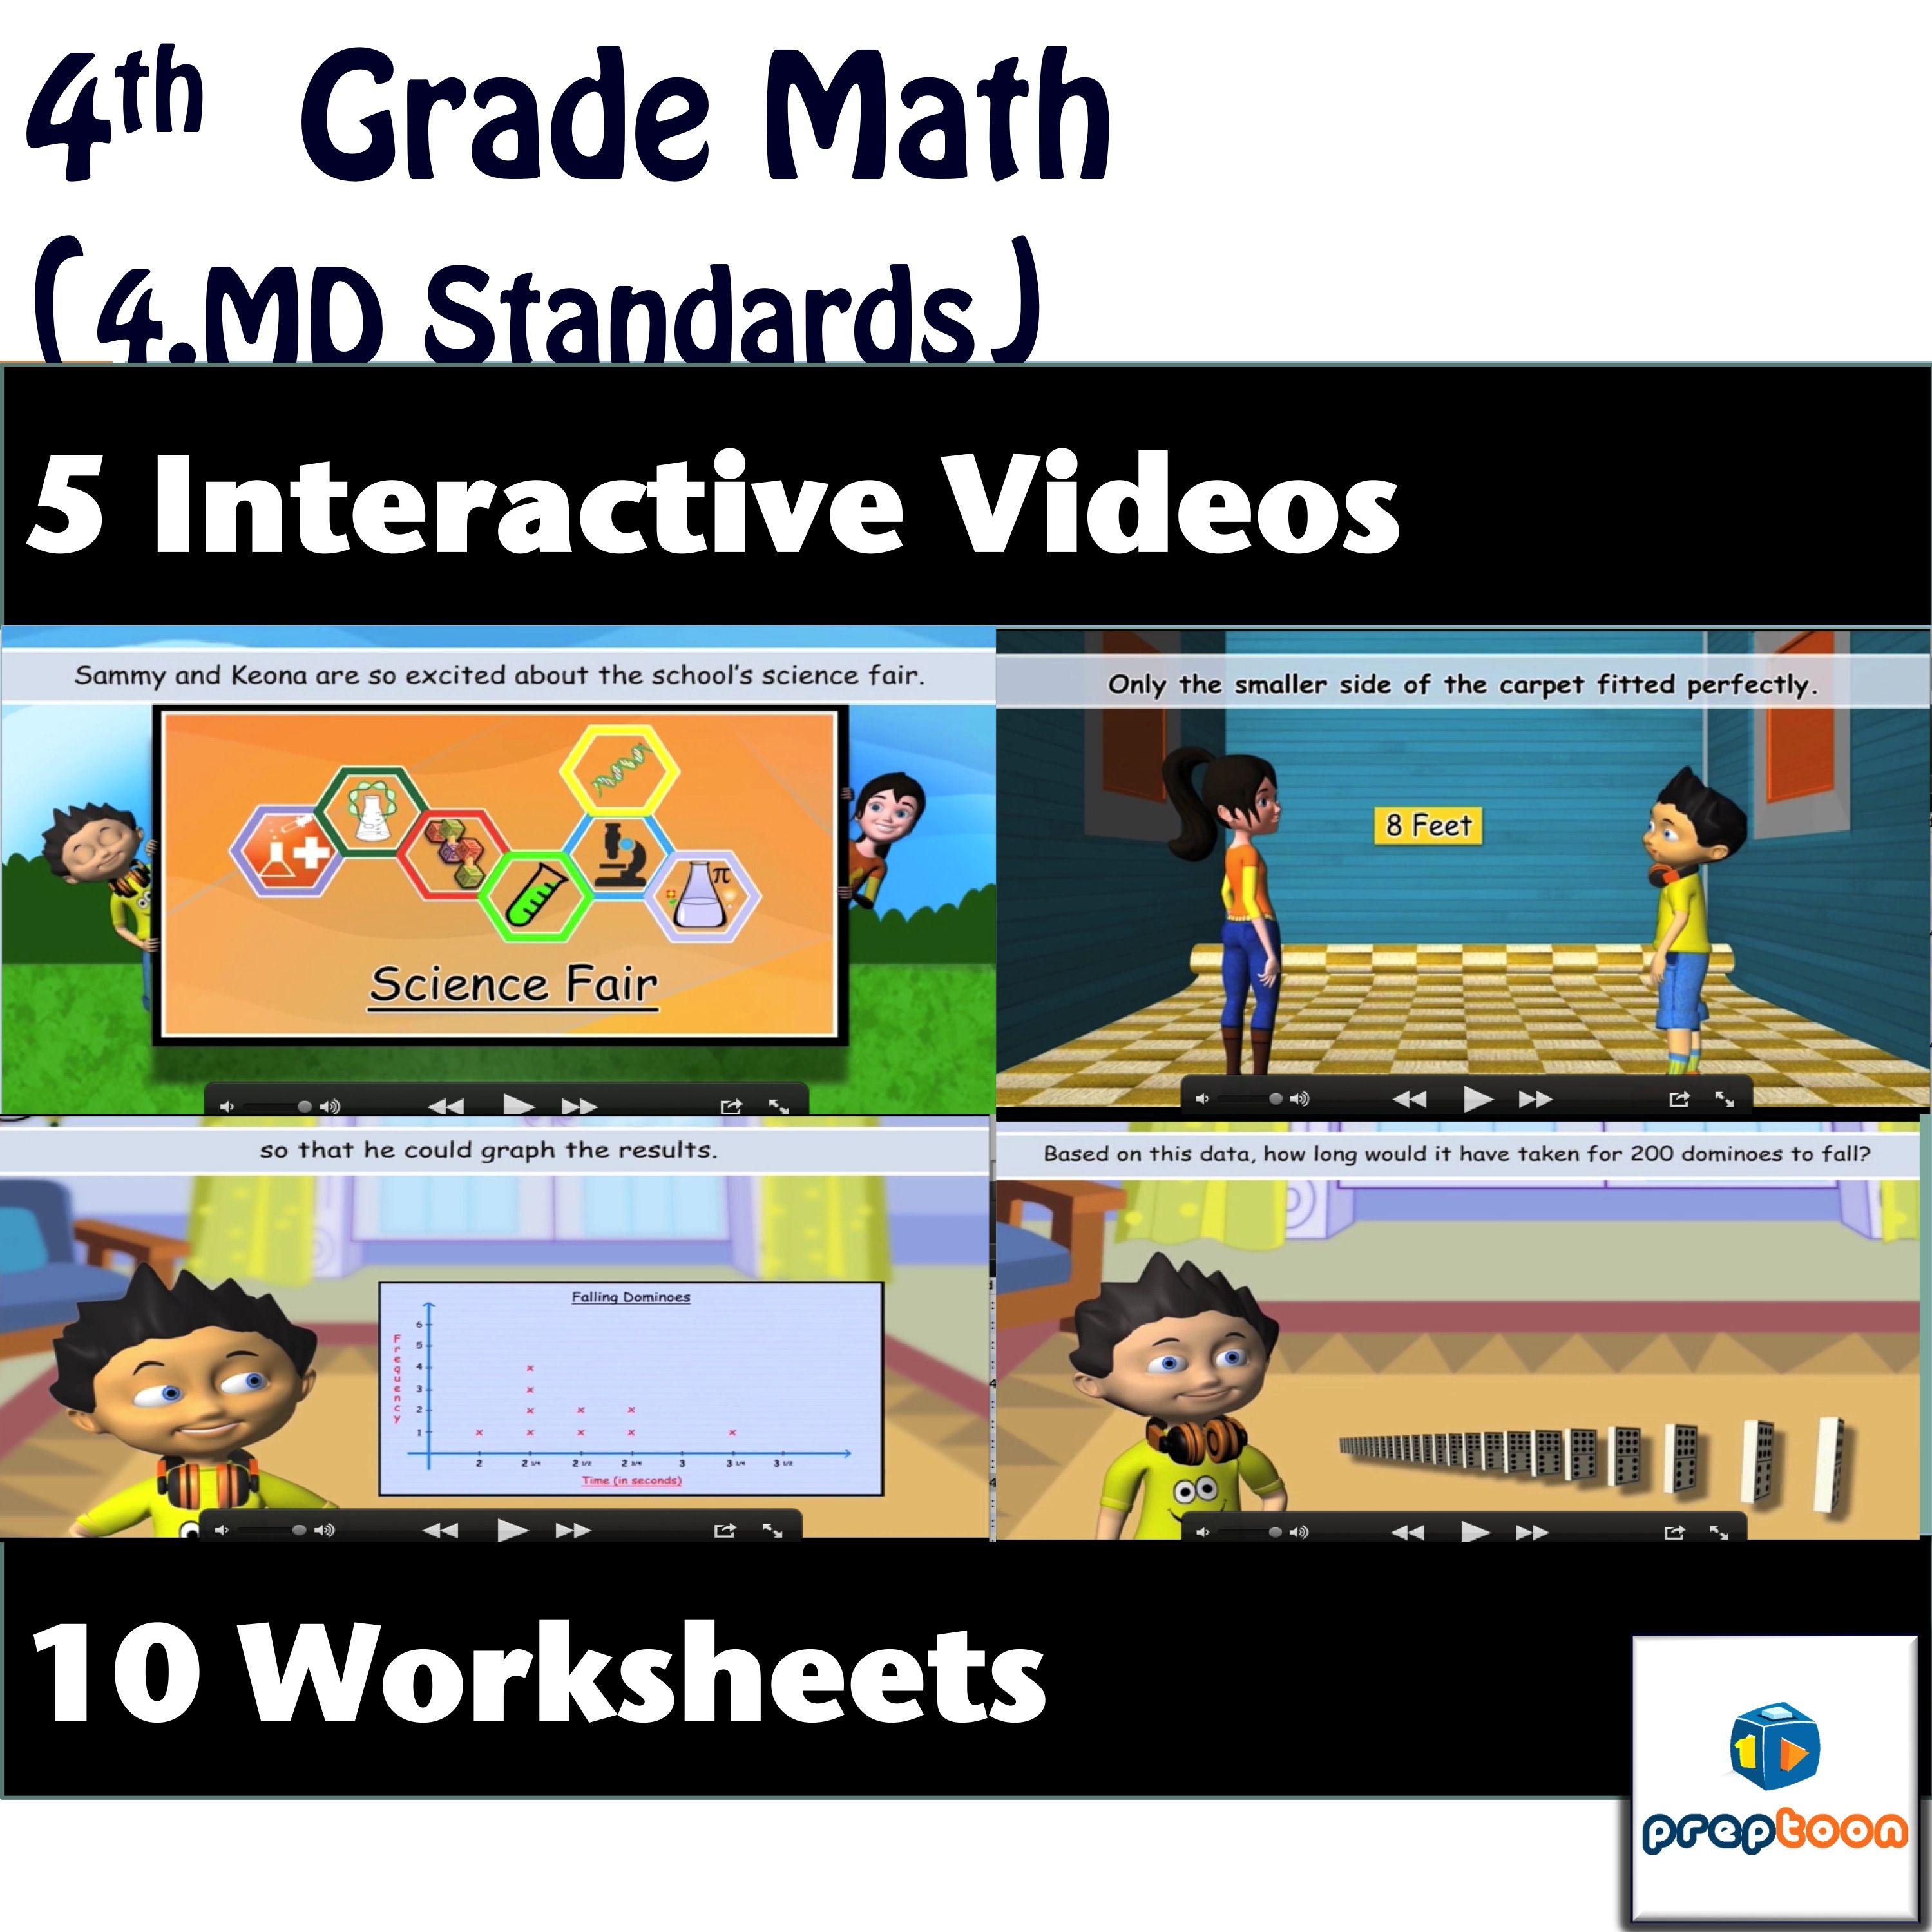 Common Core Math Measurement And Data